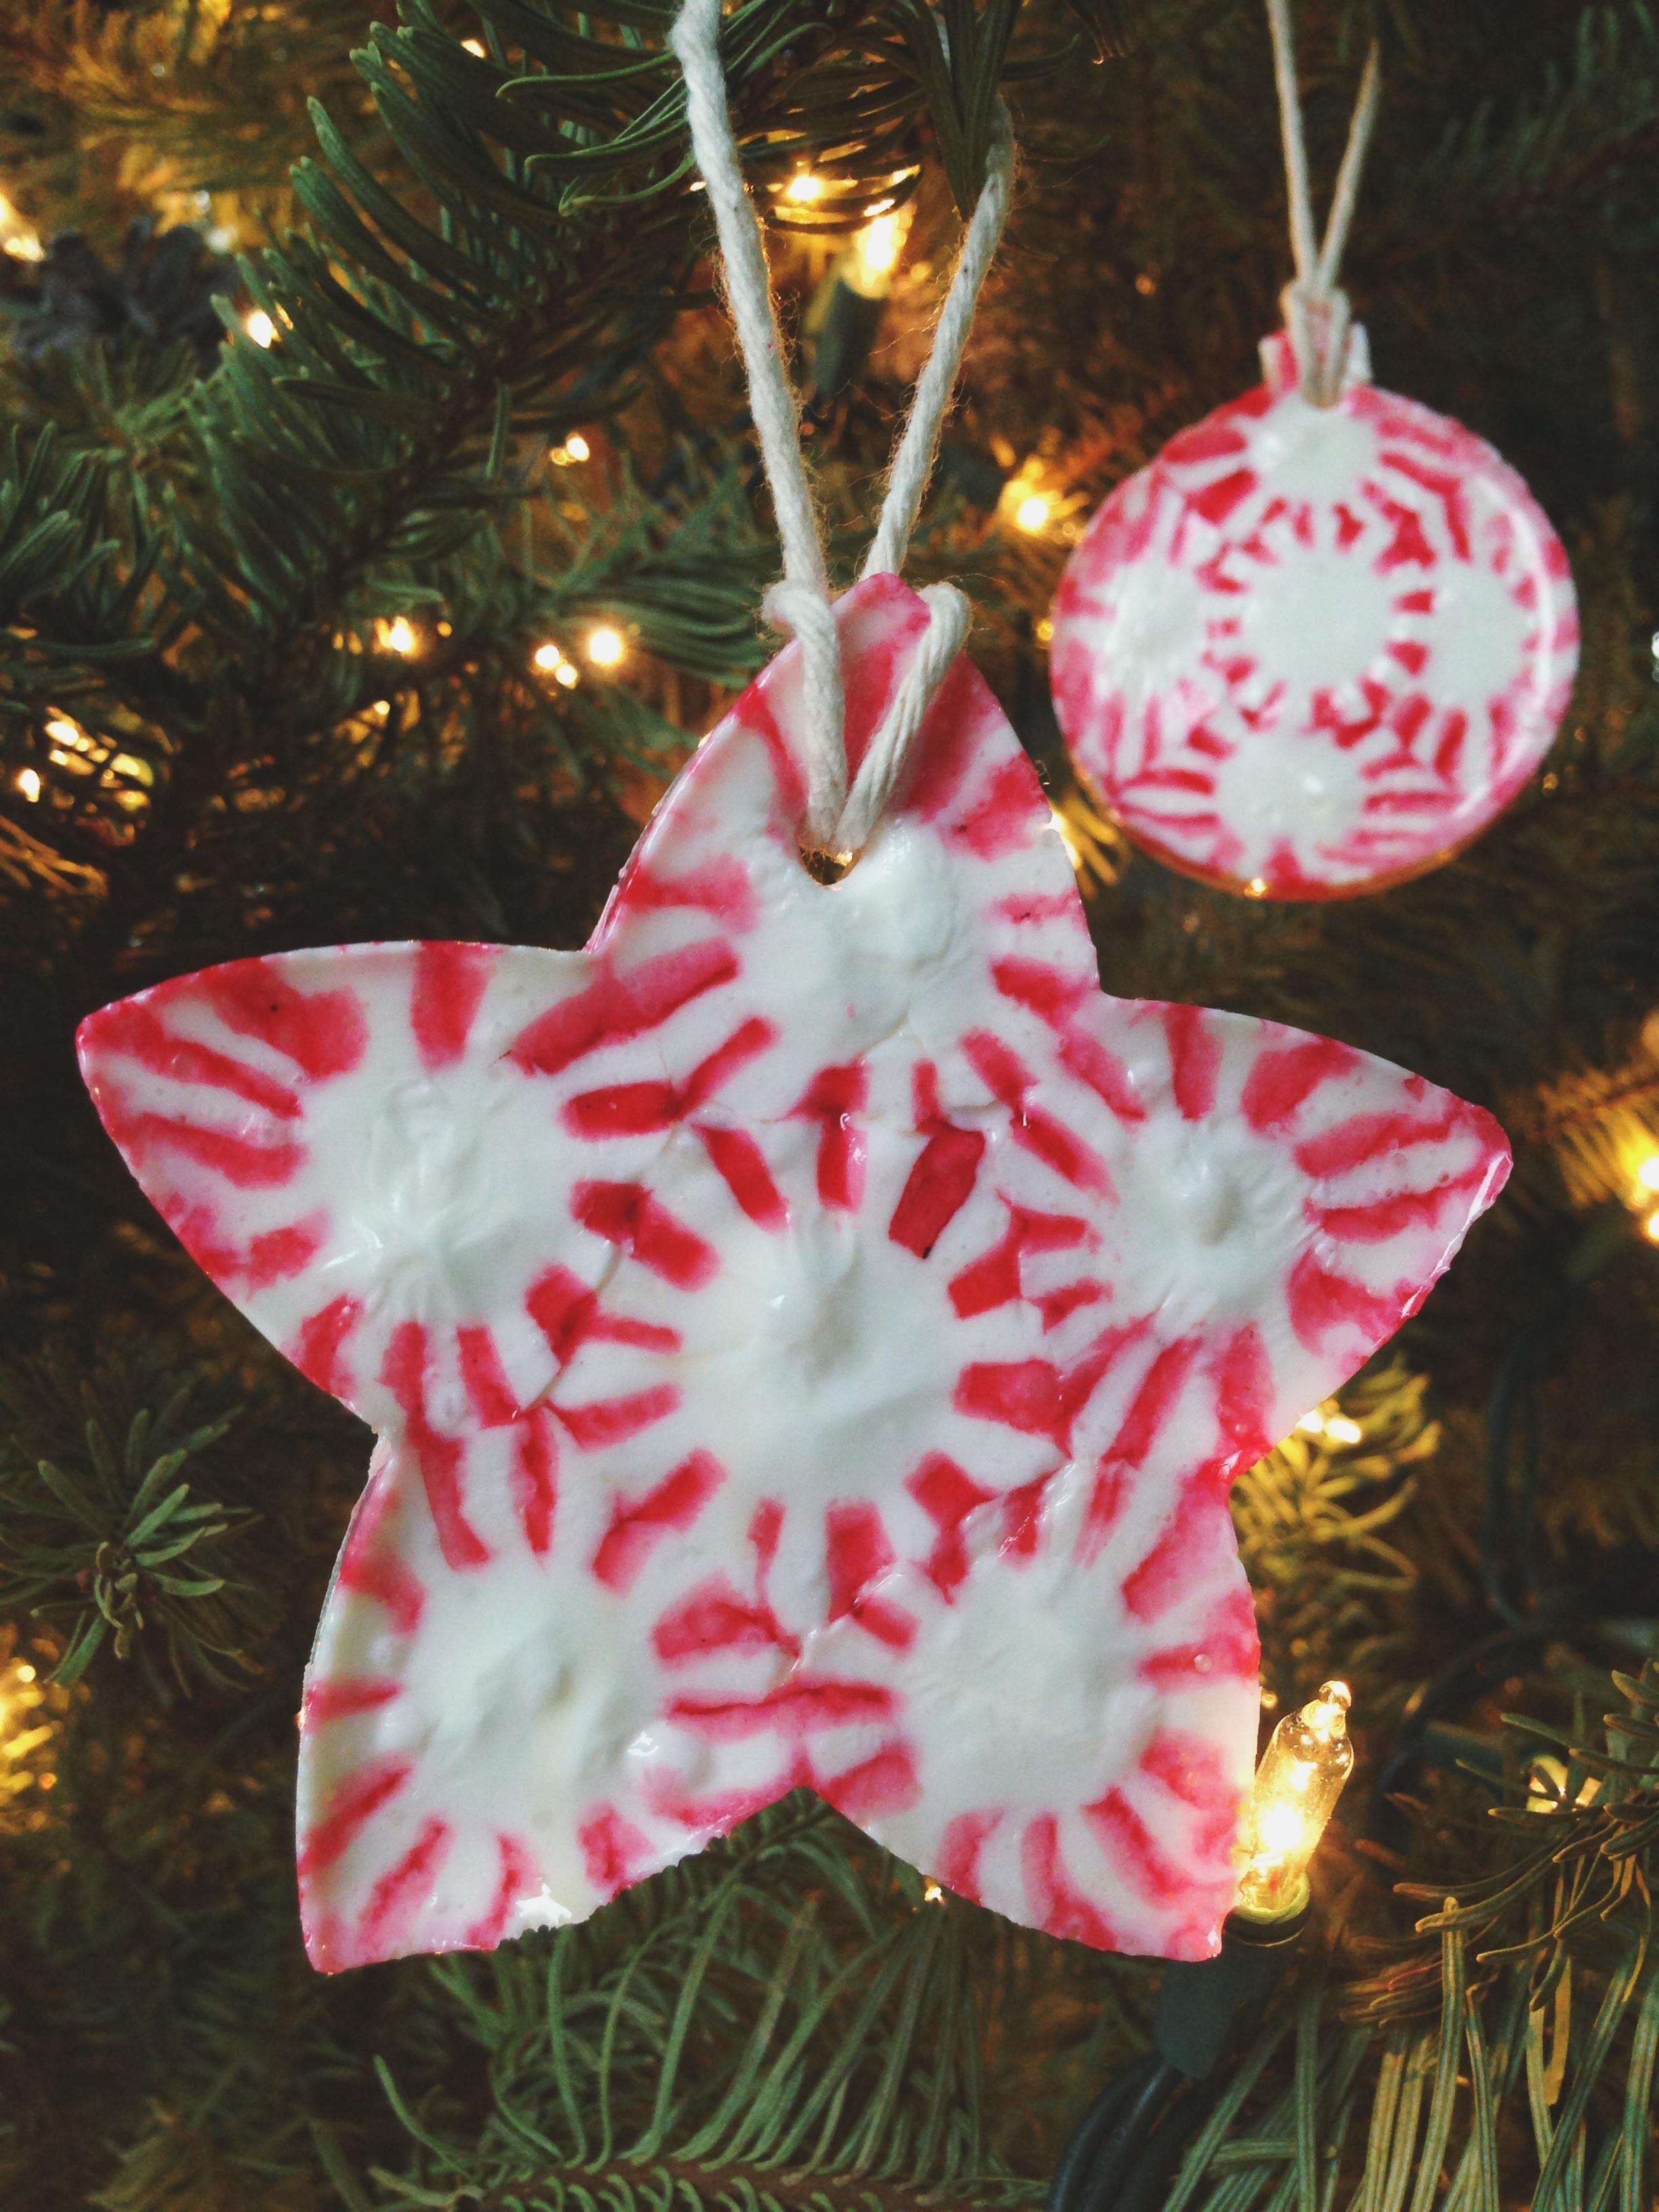 Candy Christmas Ornaments To Make  25 Beautiful Handmade Ornaments